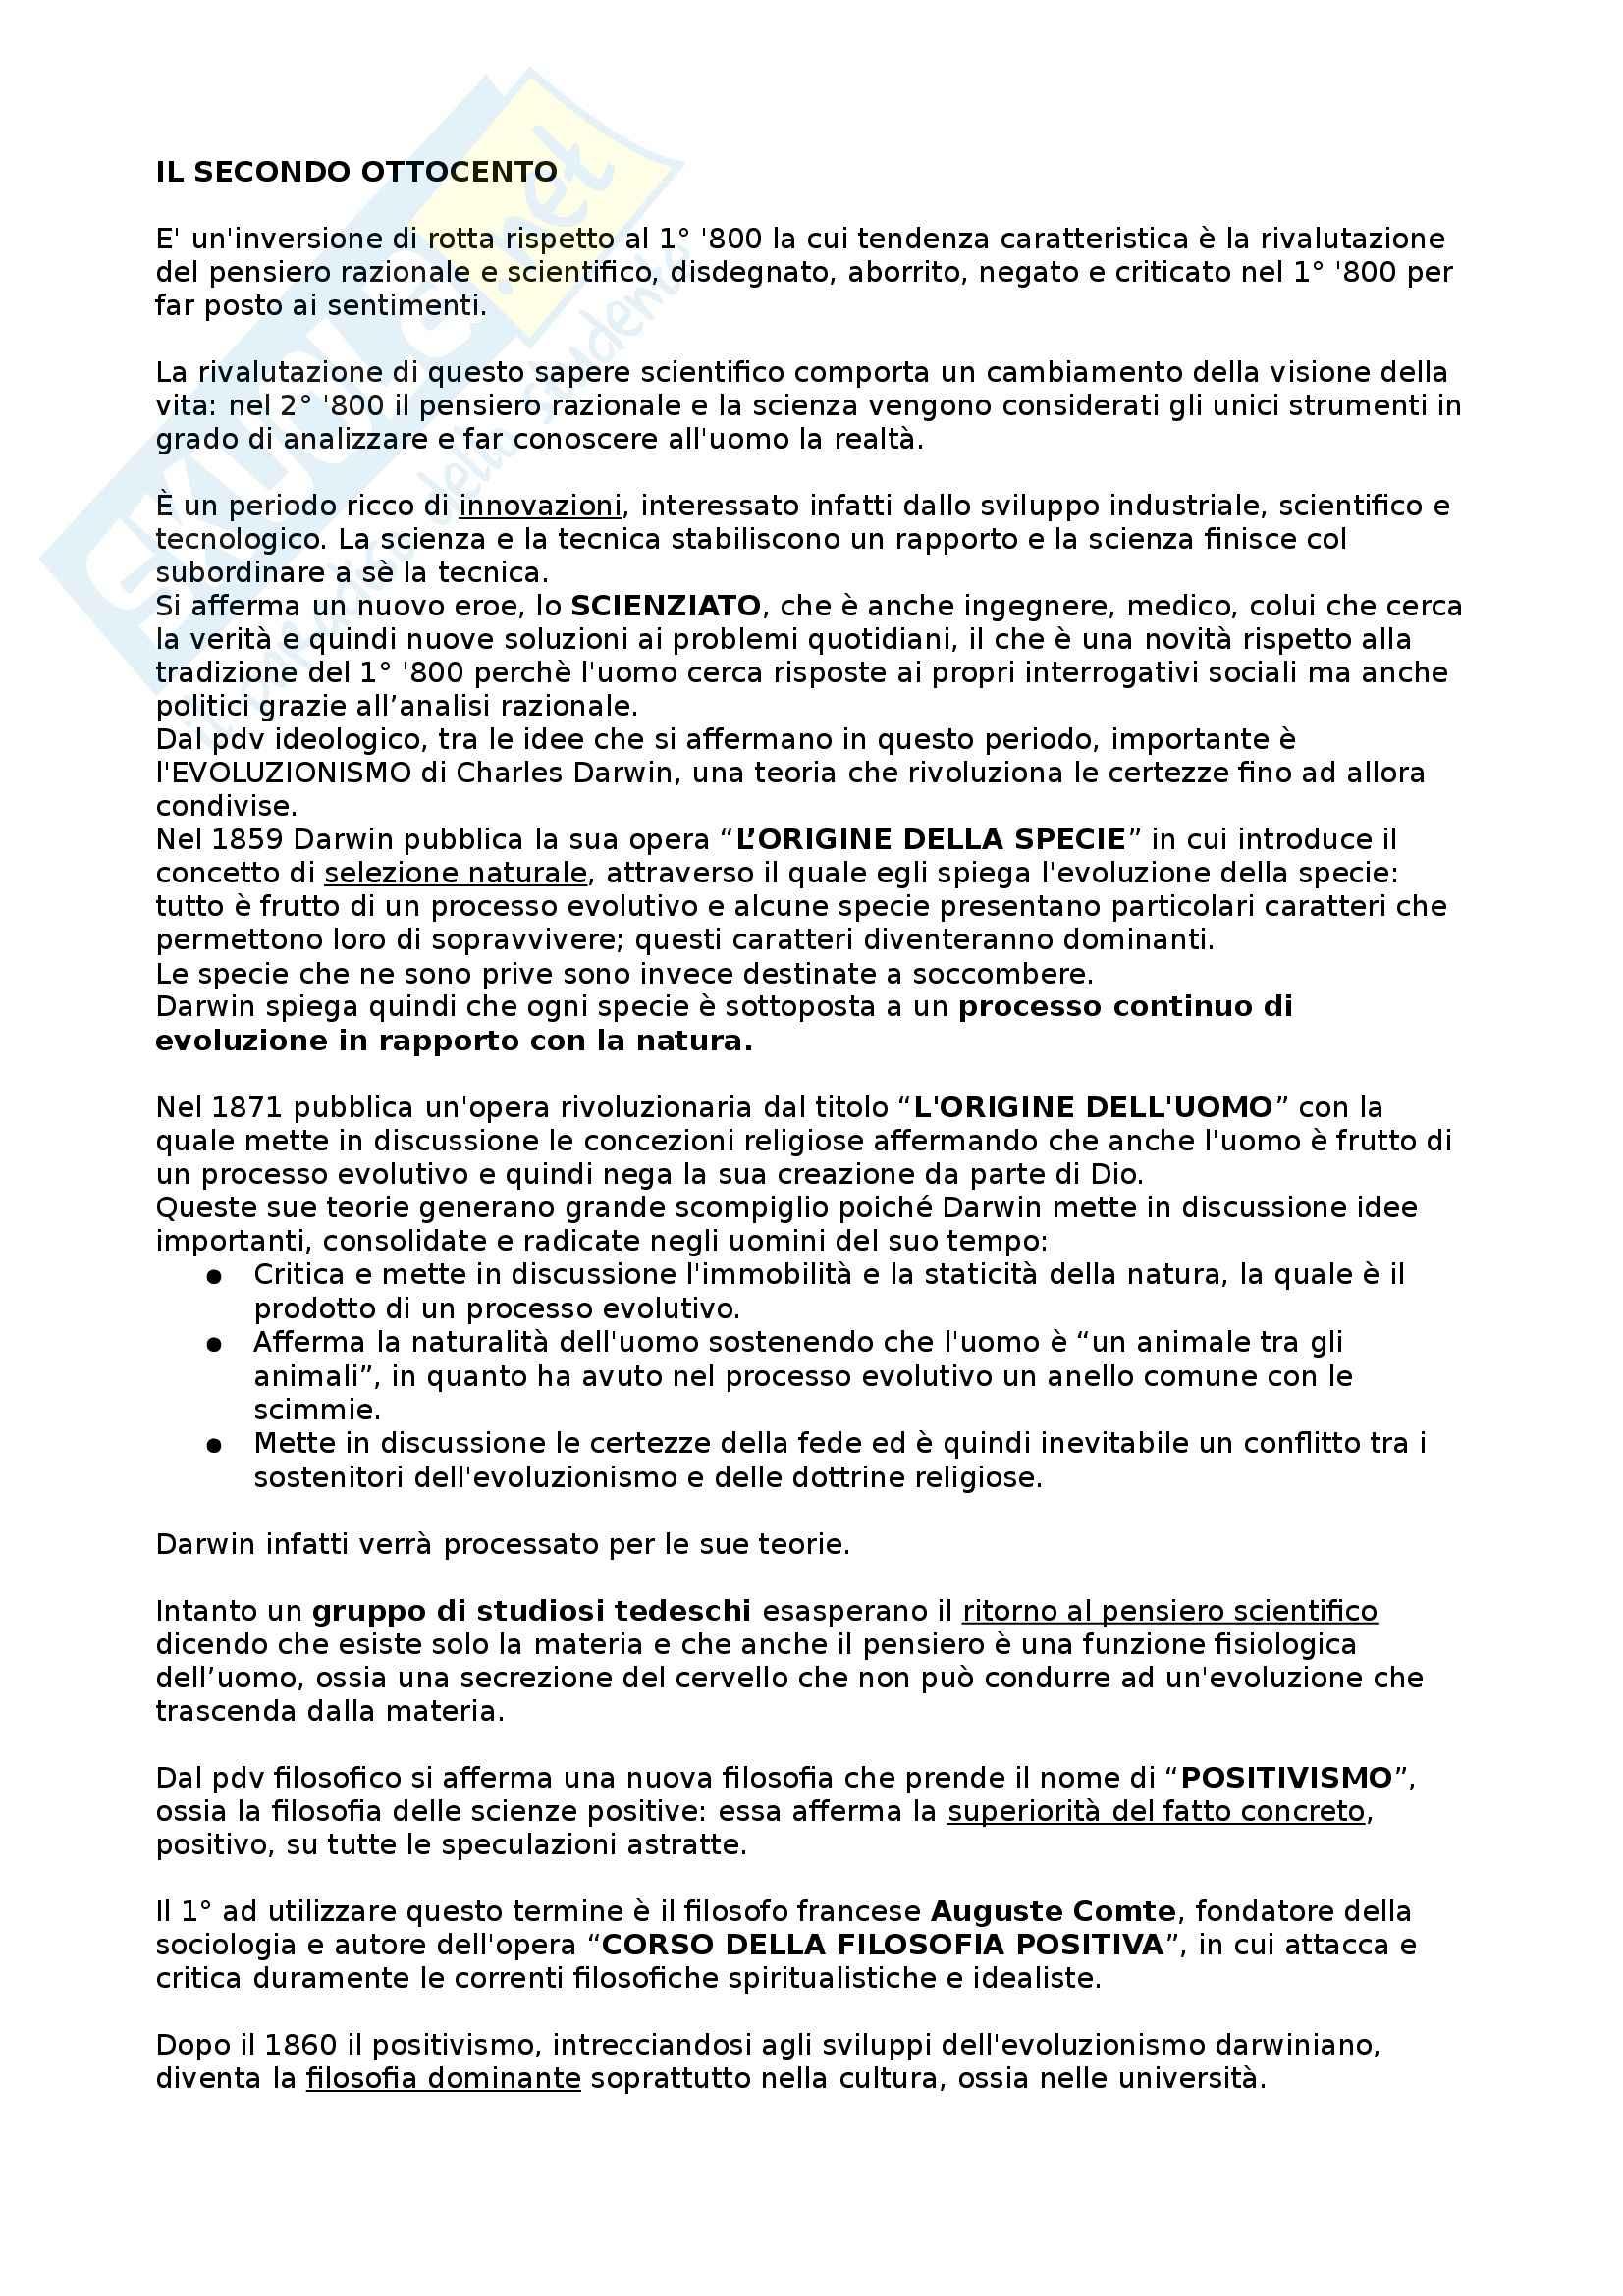 appunto D. Padua Letteratura italiana